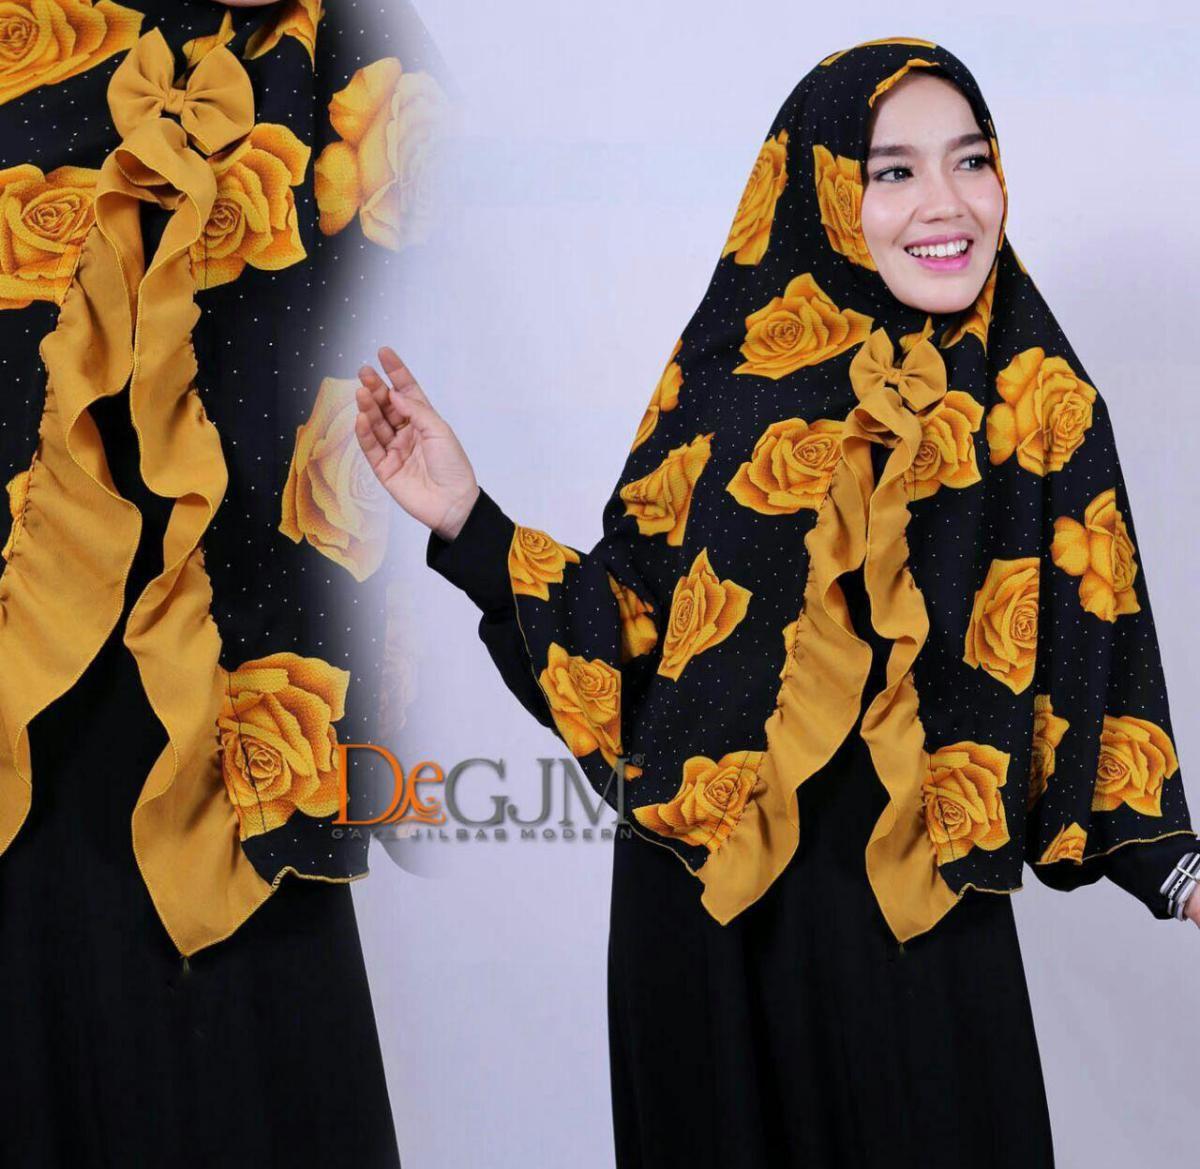 Jilbab Motif Bunga Terbaru Cantik Modern Janeta Rose  Kecantikan